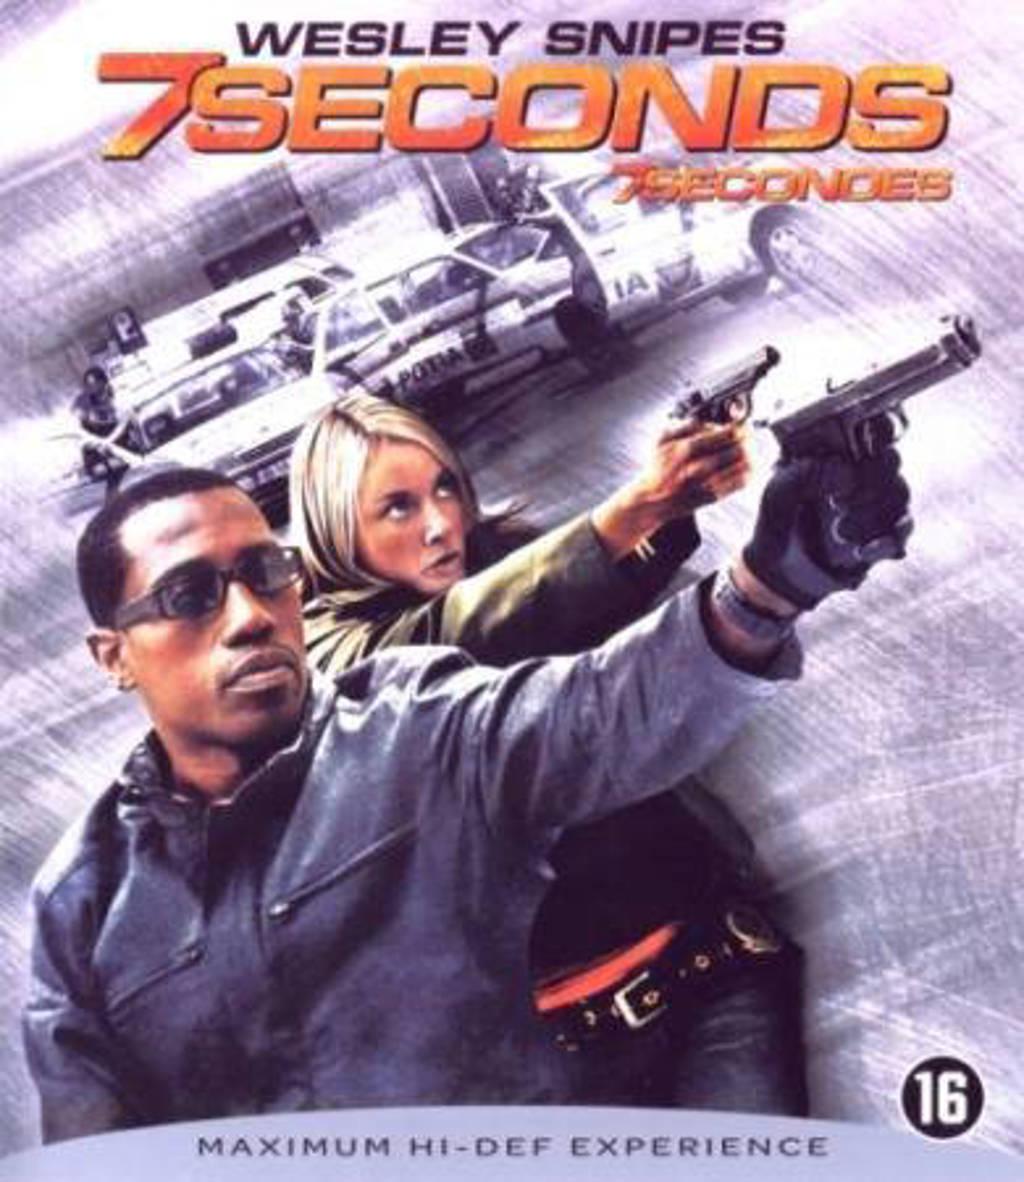 7 seconds (Blu-ray)